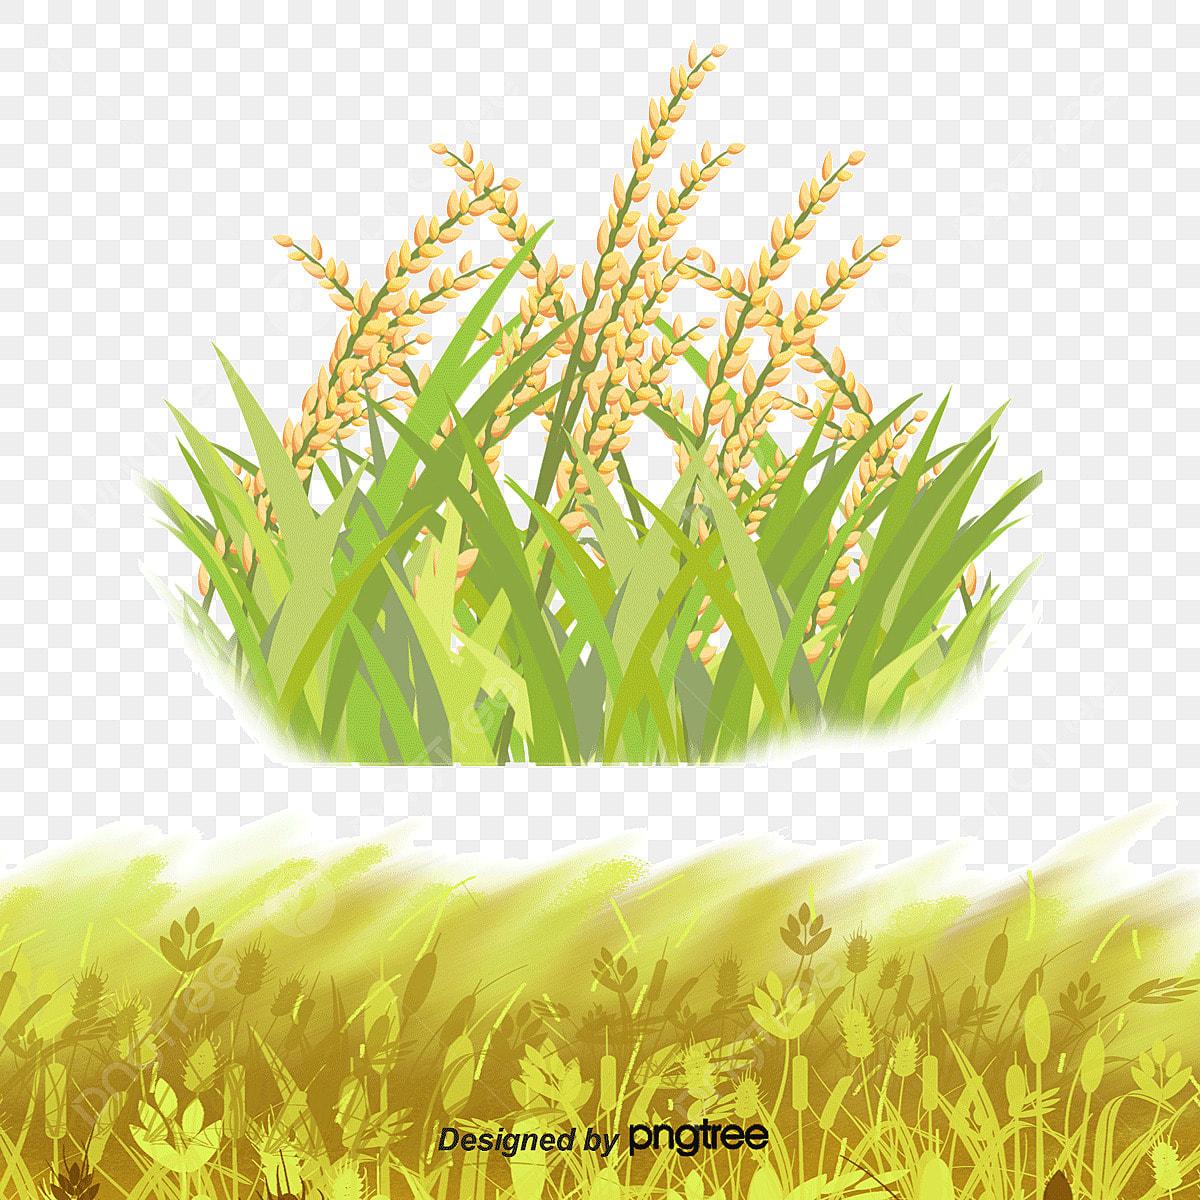 Farmers Harvesting Rice Stock Illustrations, Images & Vectors | Shutterstock